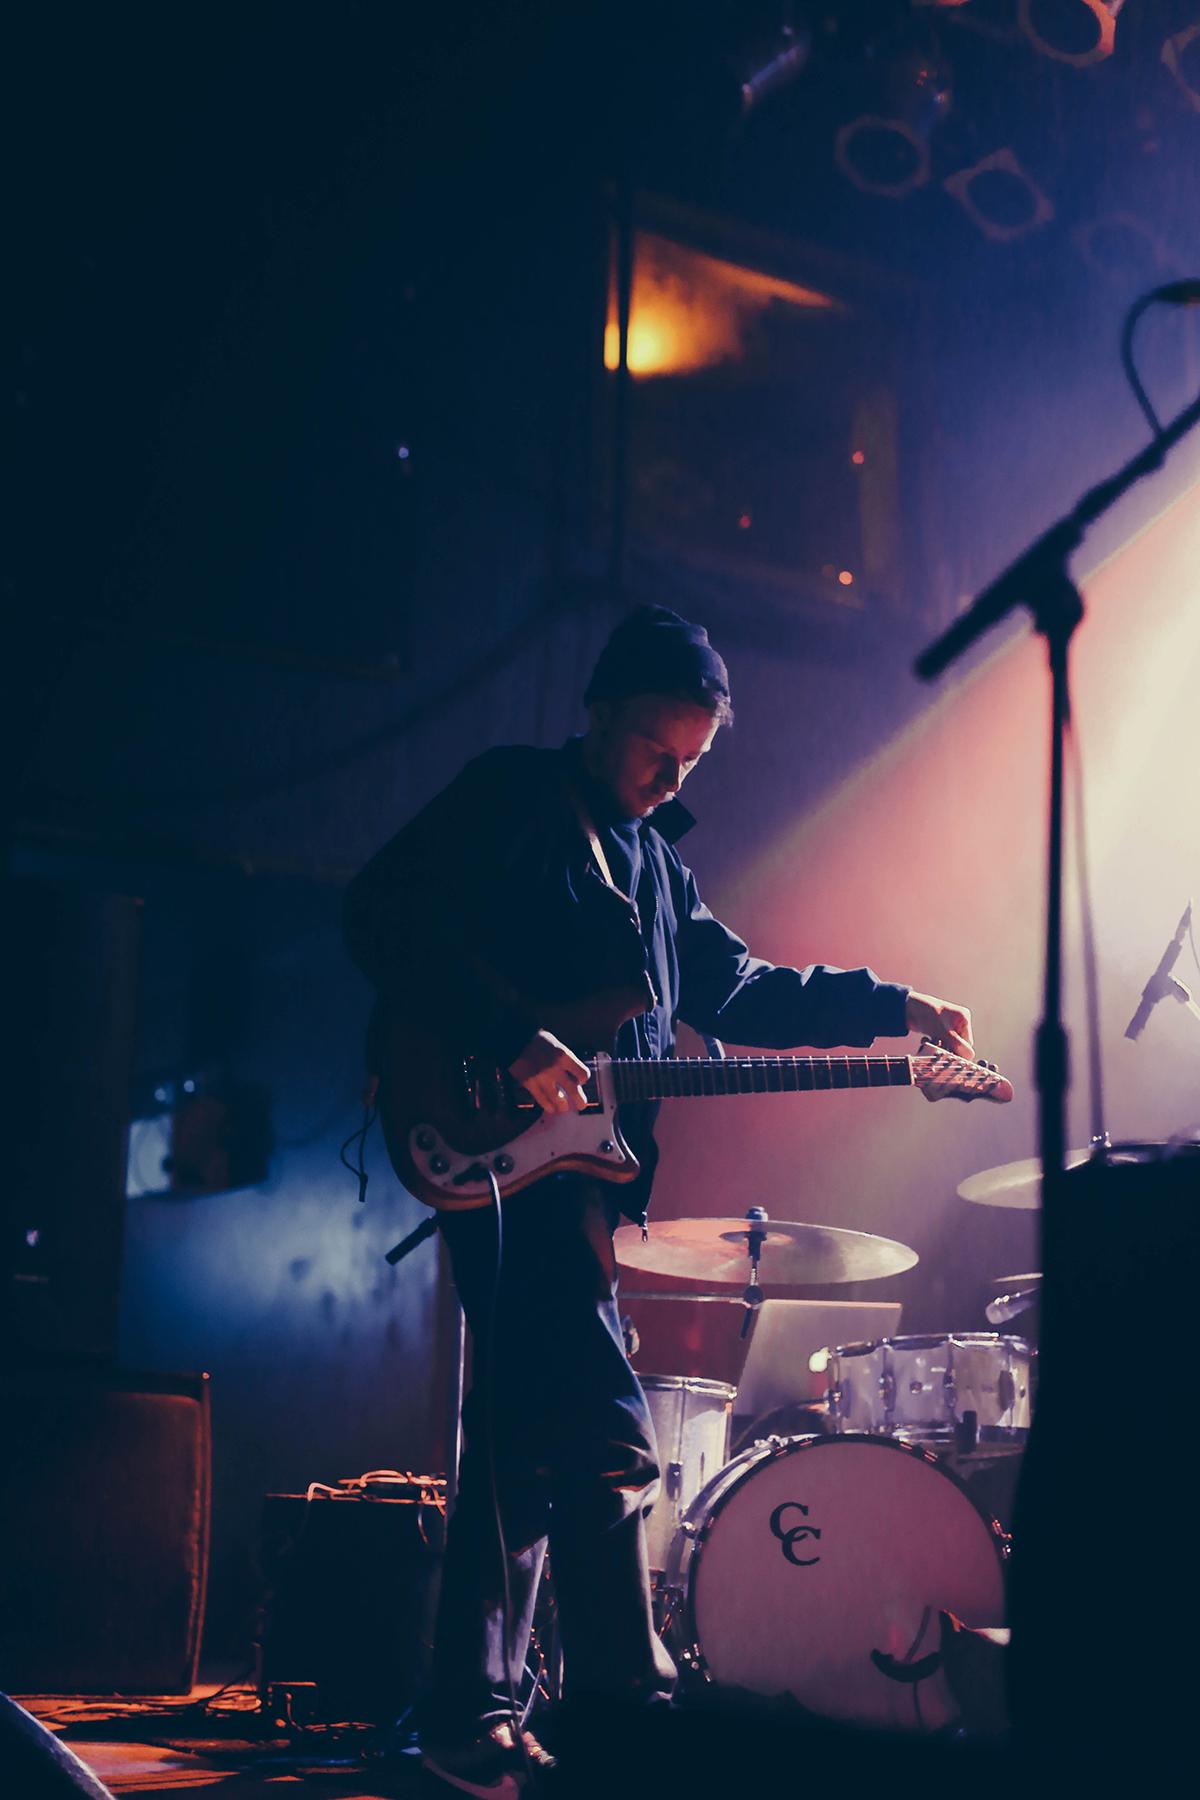 Toronto Concert Photography